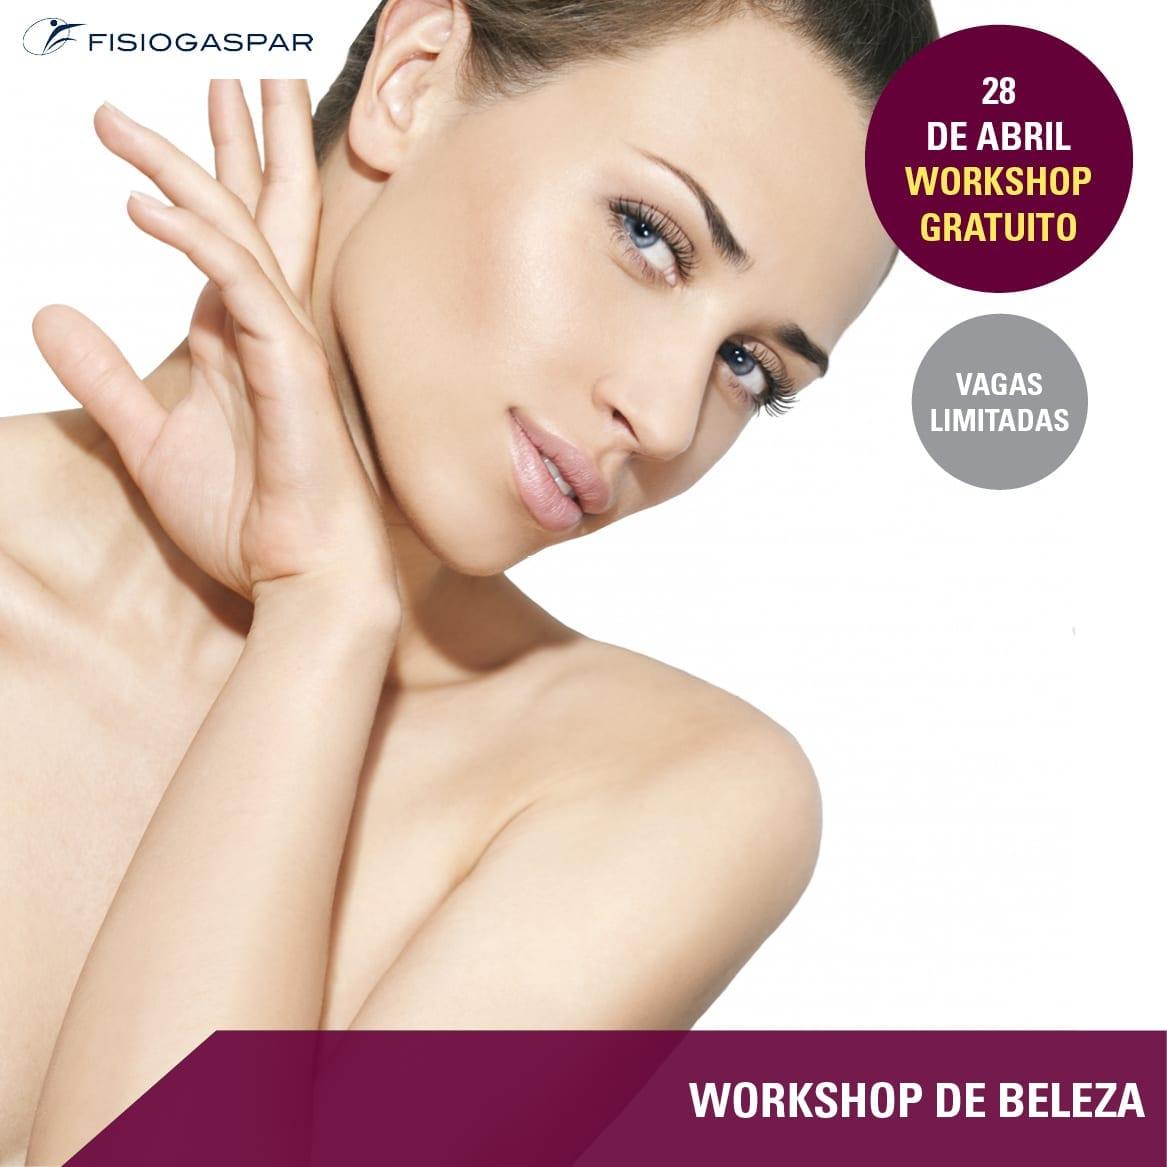 fisiogaspar workshop beleza gratis 28 abril